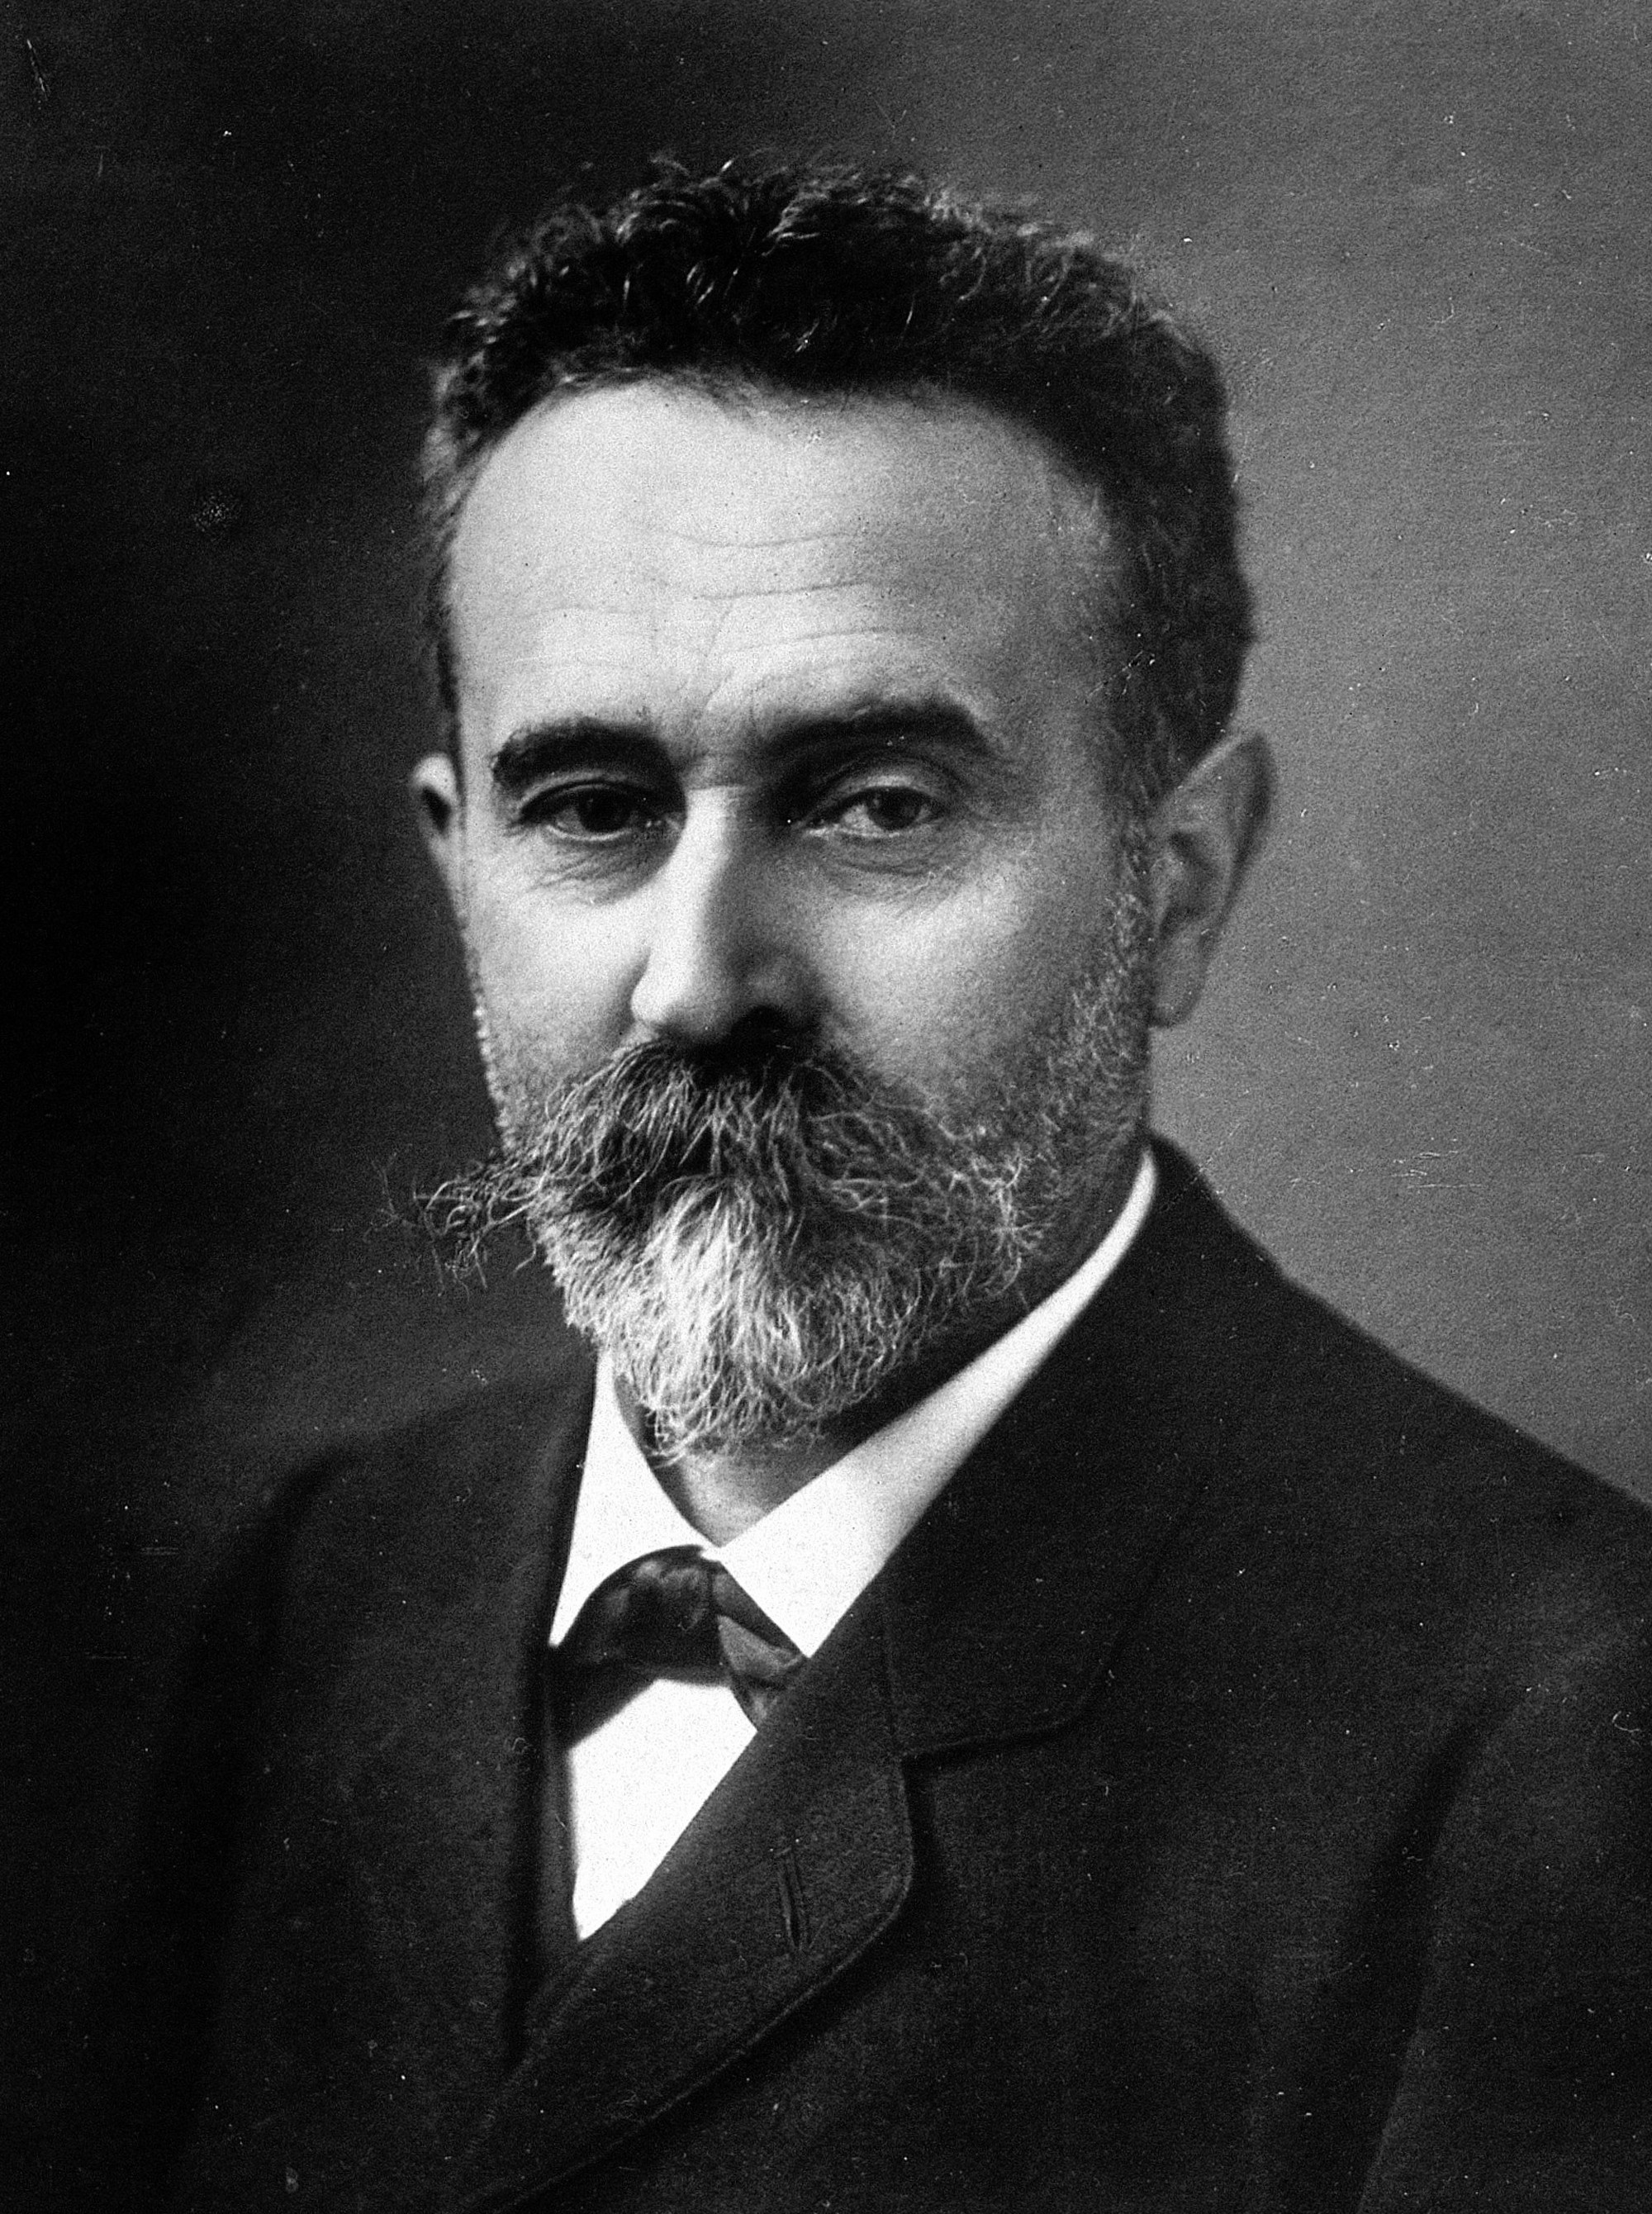 Image of Alphonse Bertillon from Wikidata